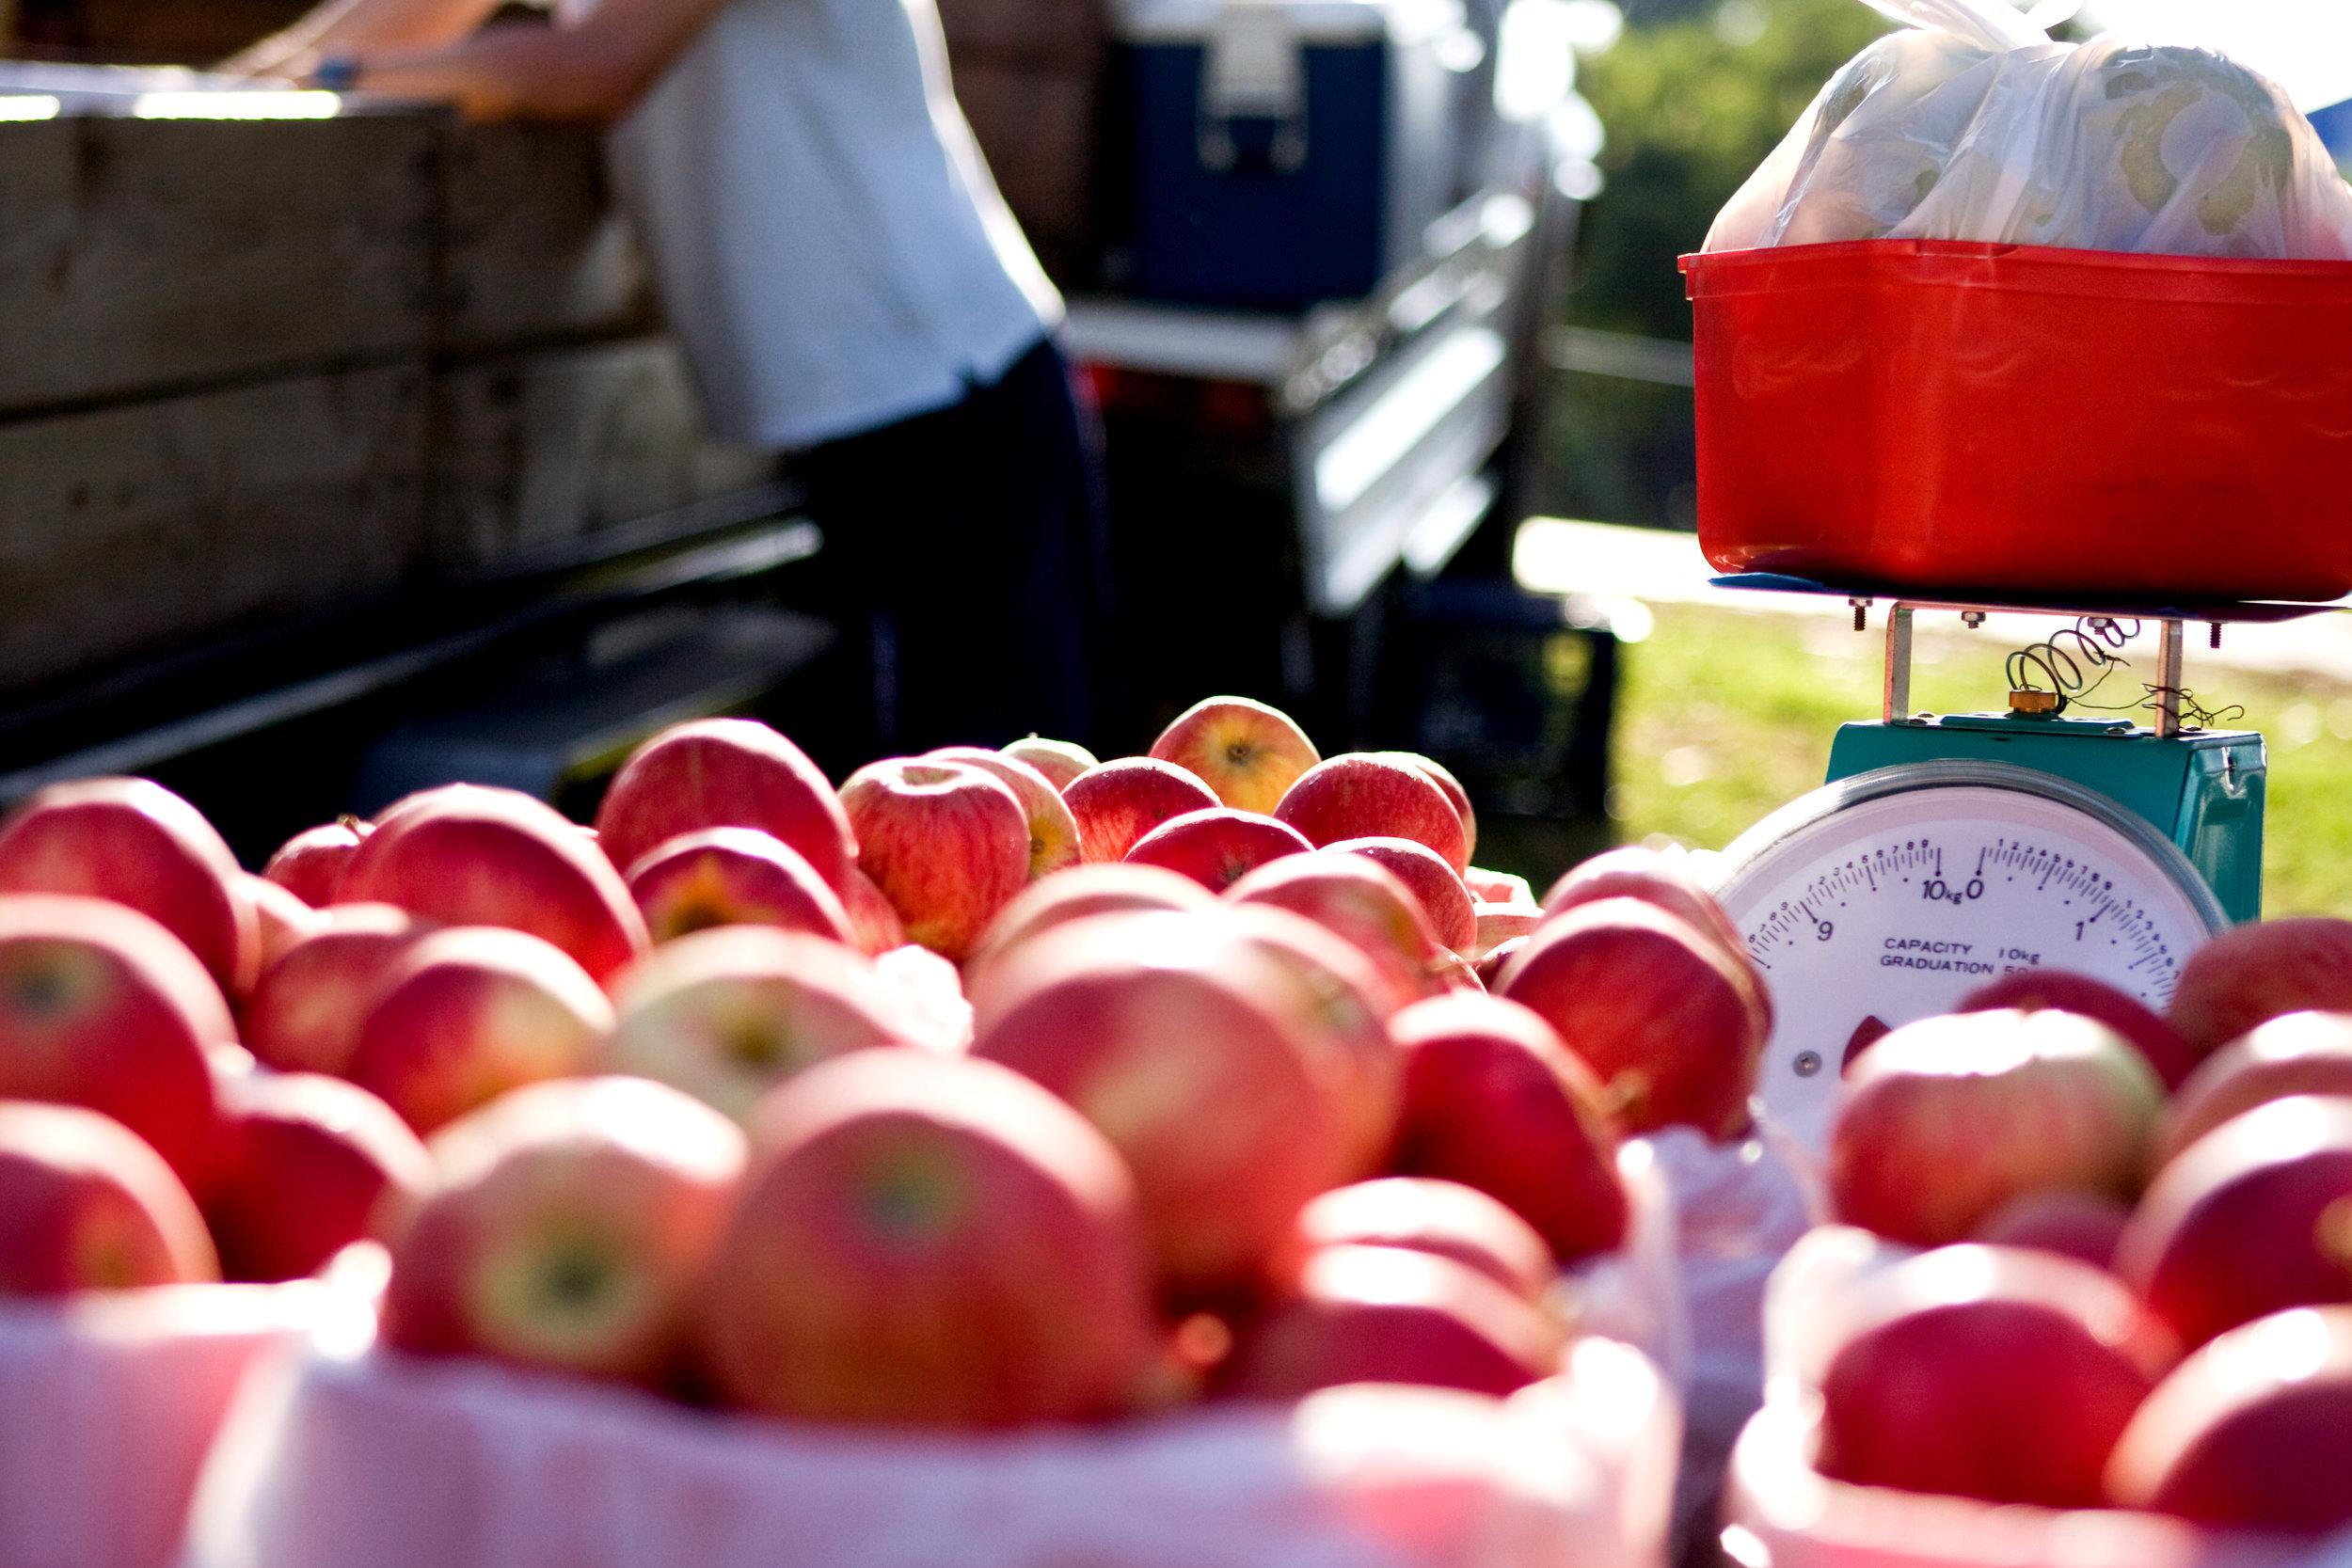 Faremers_Market_apples (1).jpg